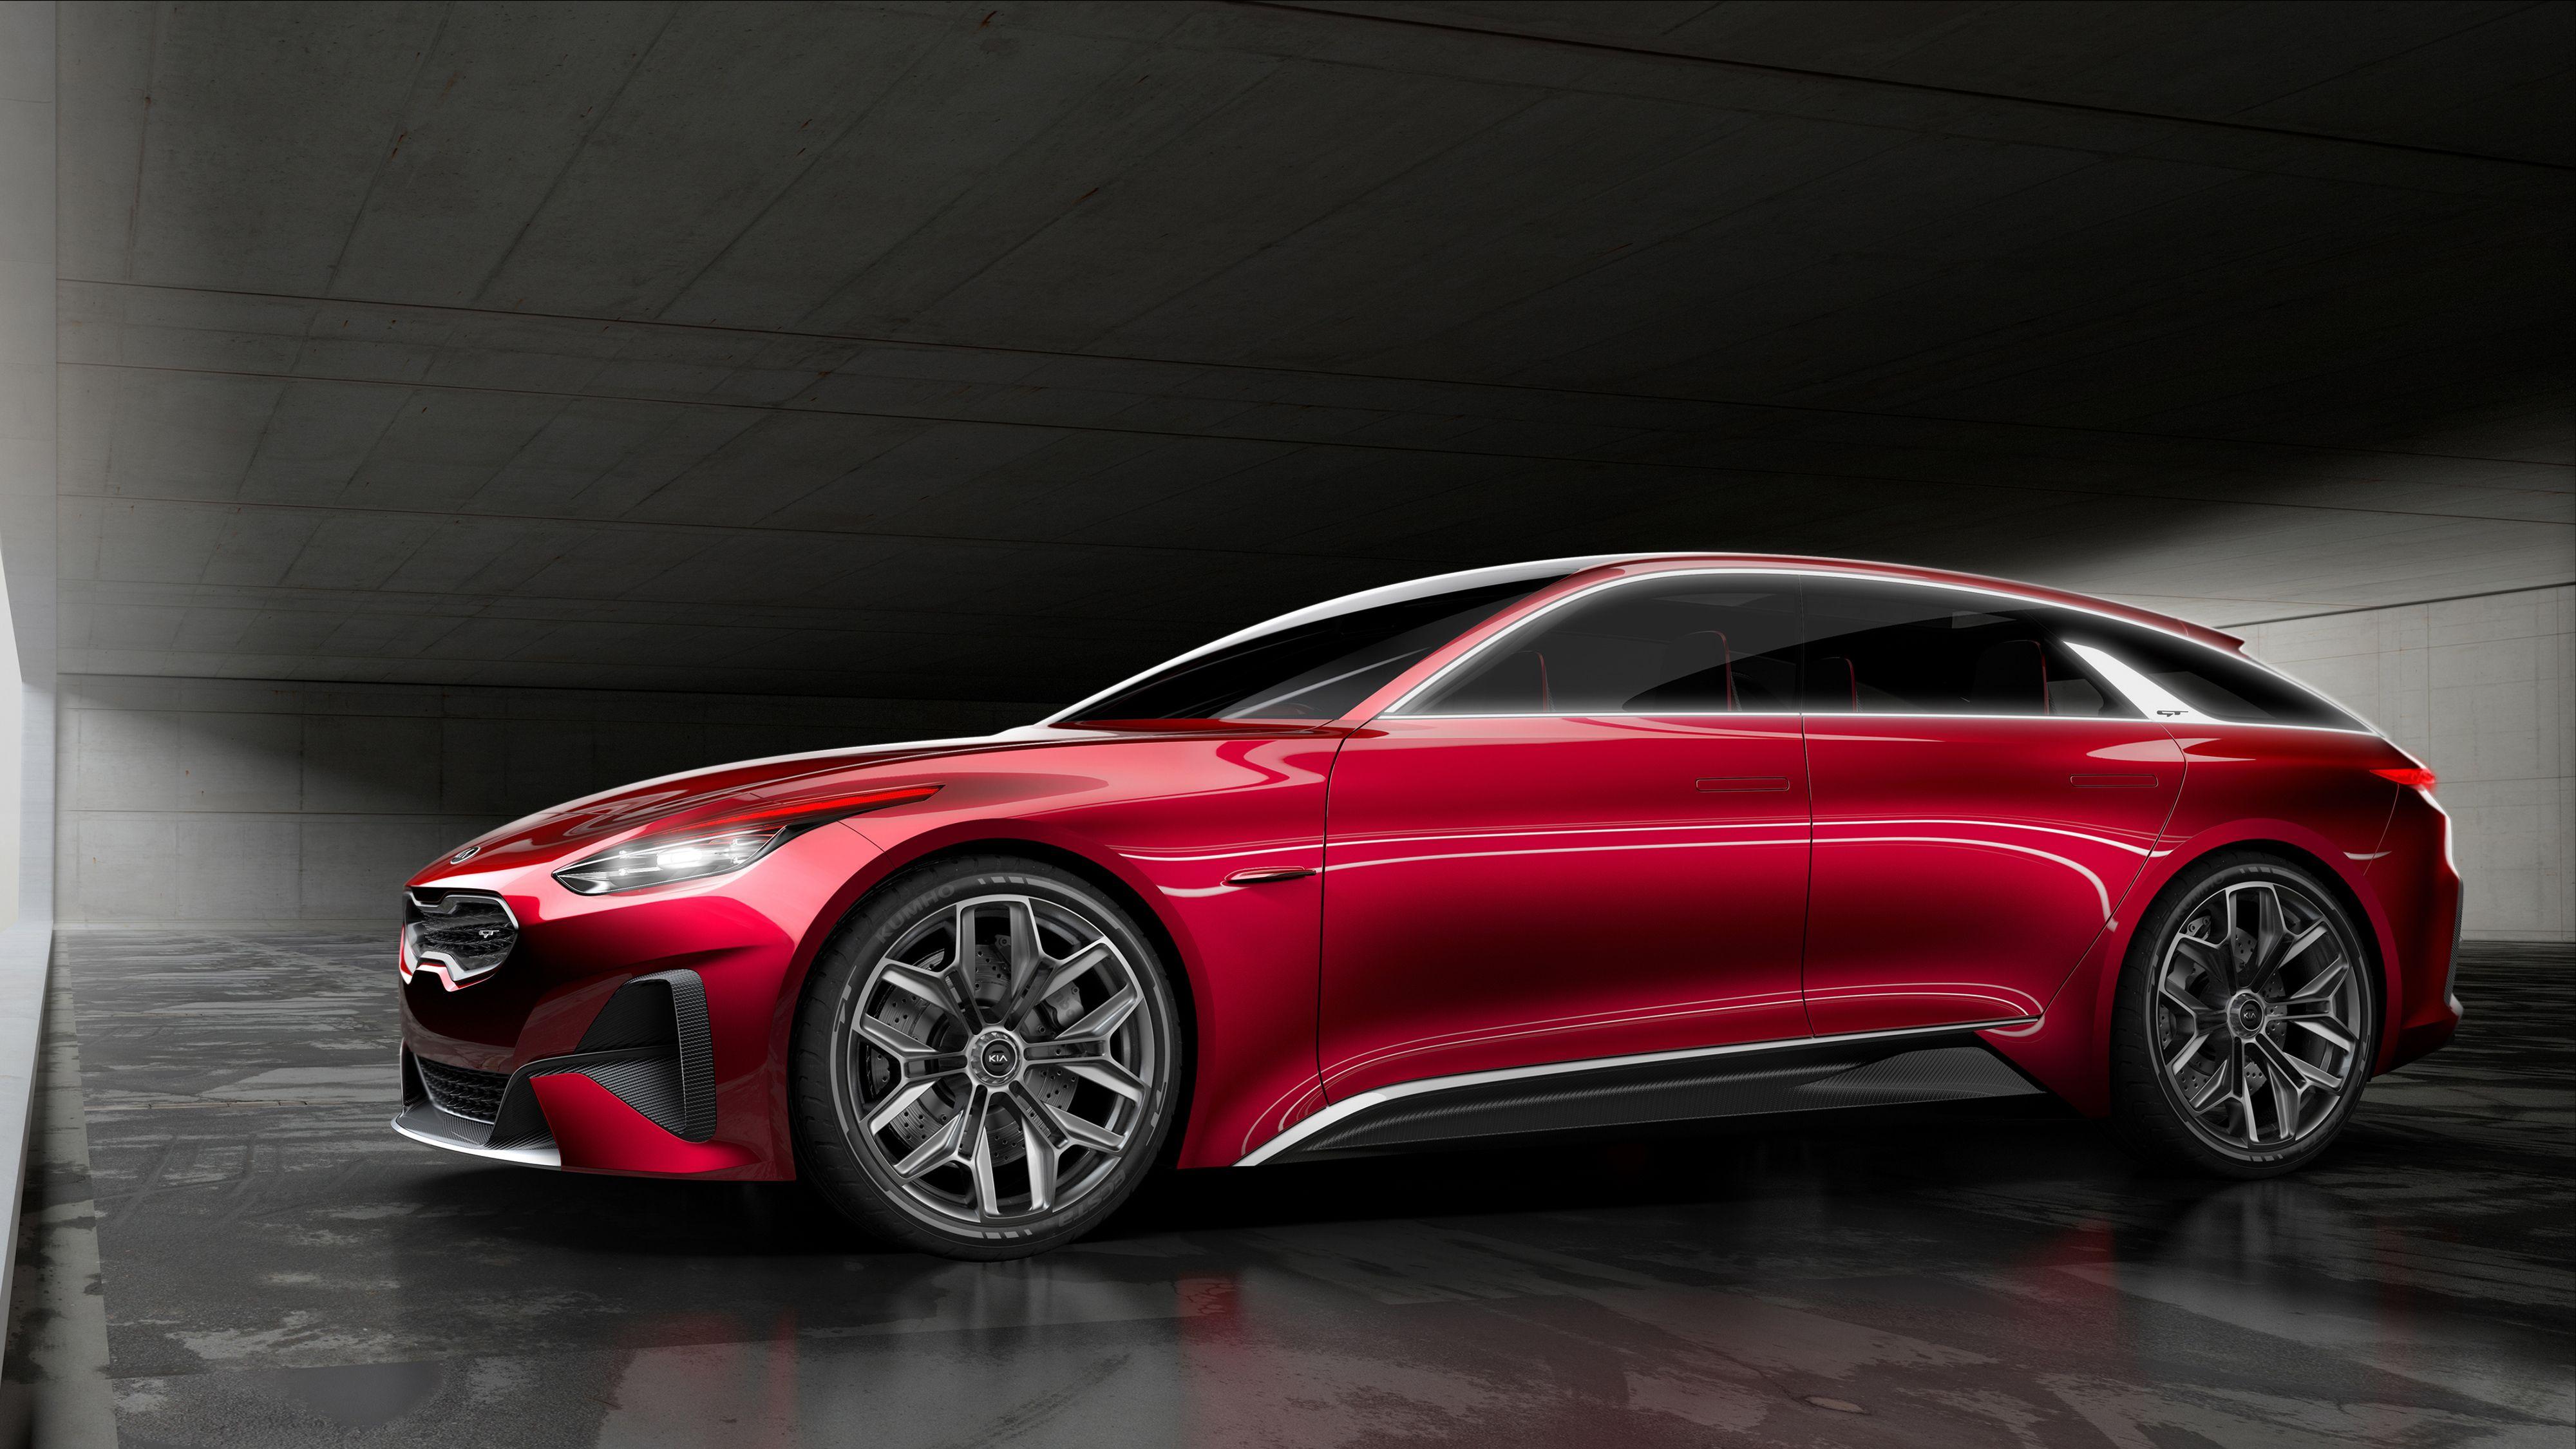 Image Result For Kia Proceed New Cars Kia Automotive Group Kia proceed concept frankfurt motor show